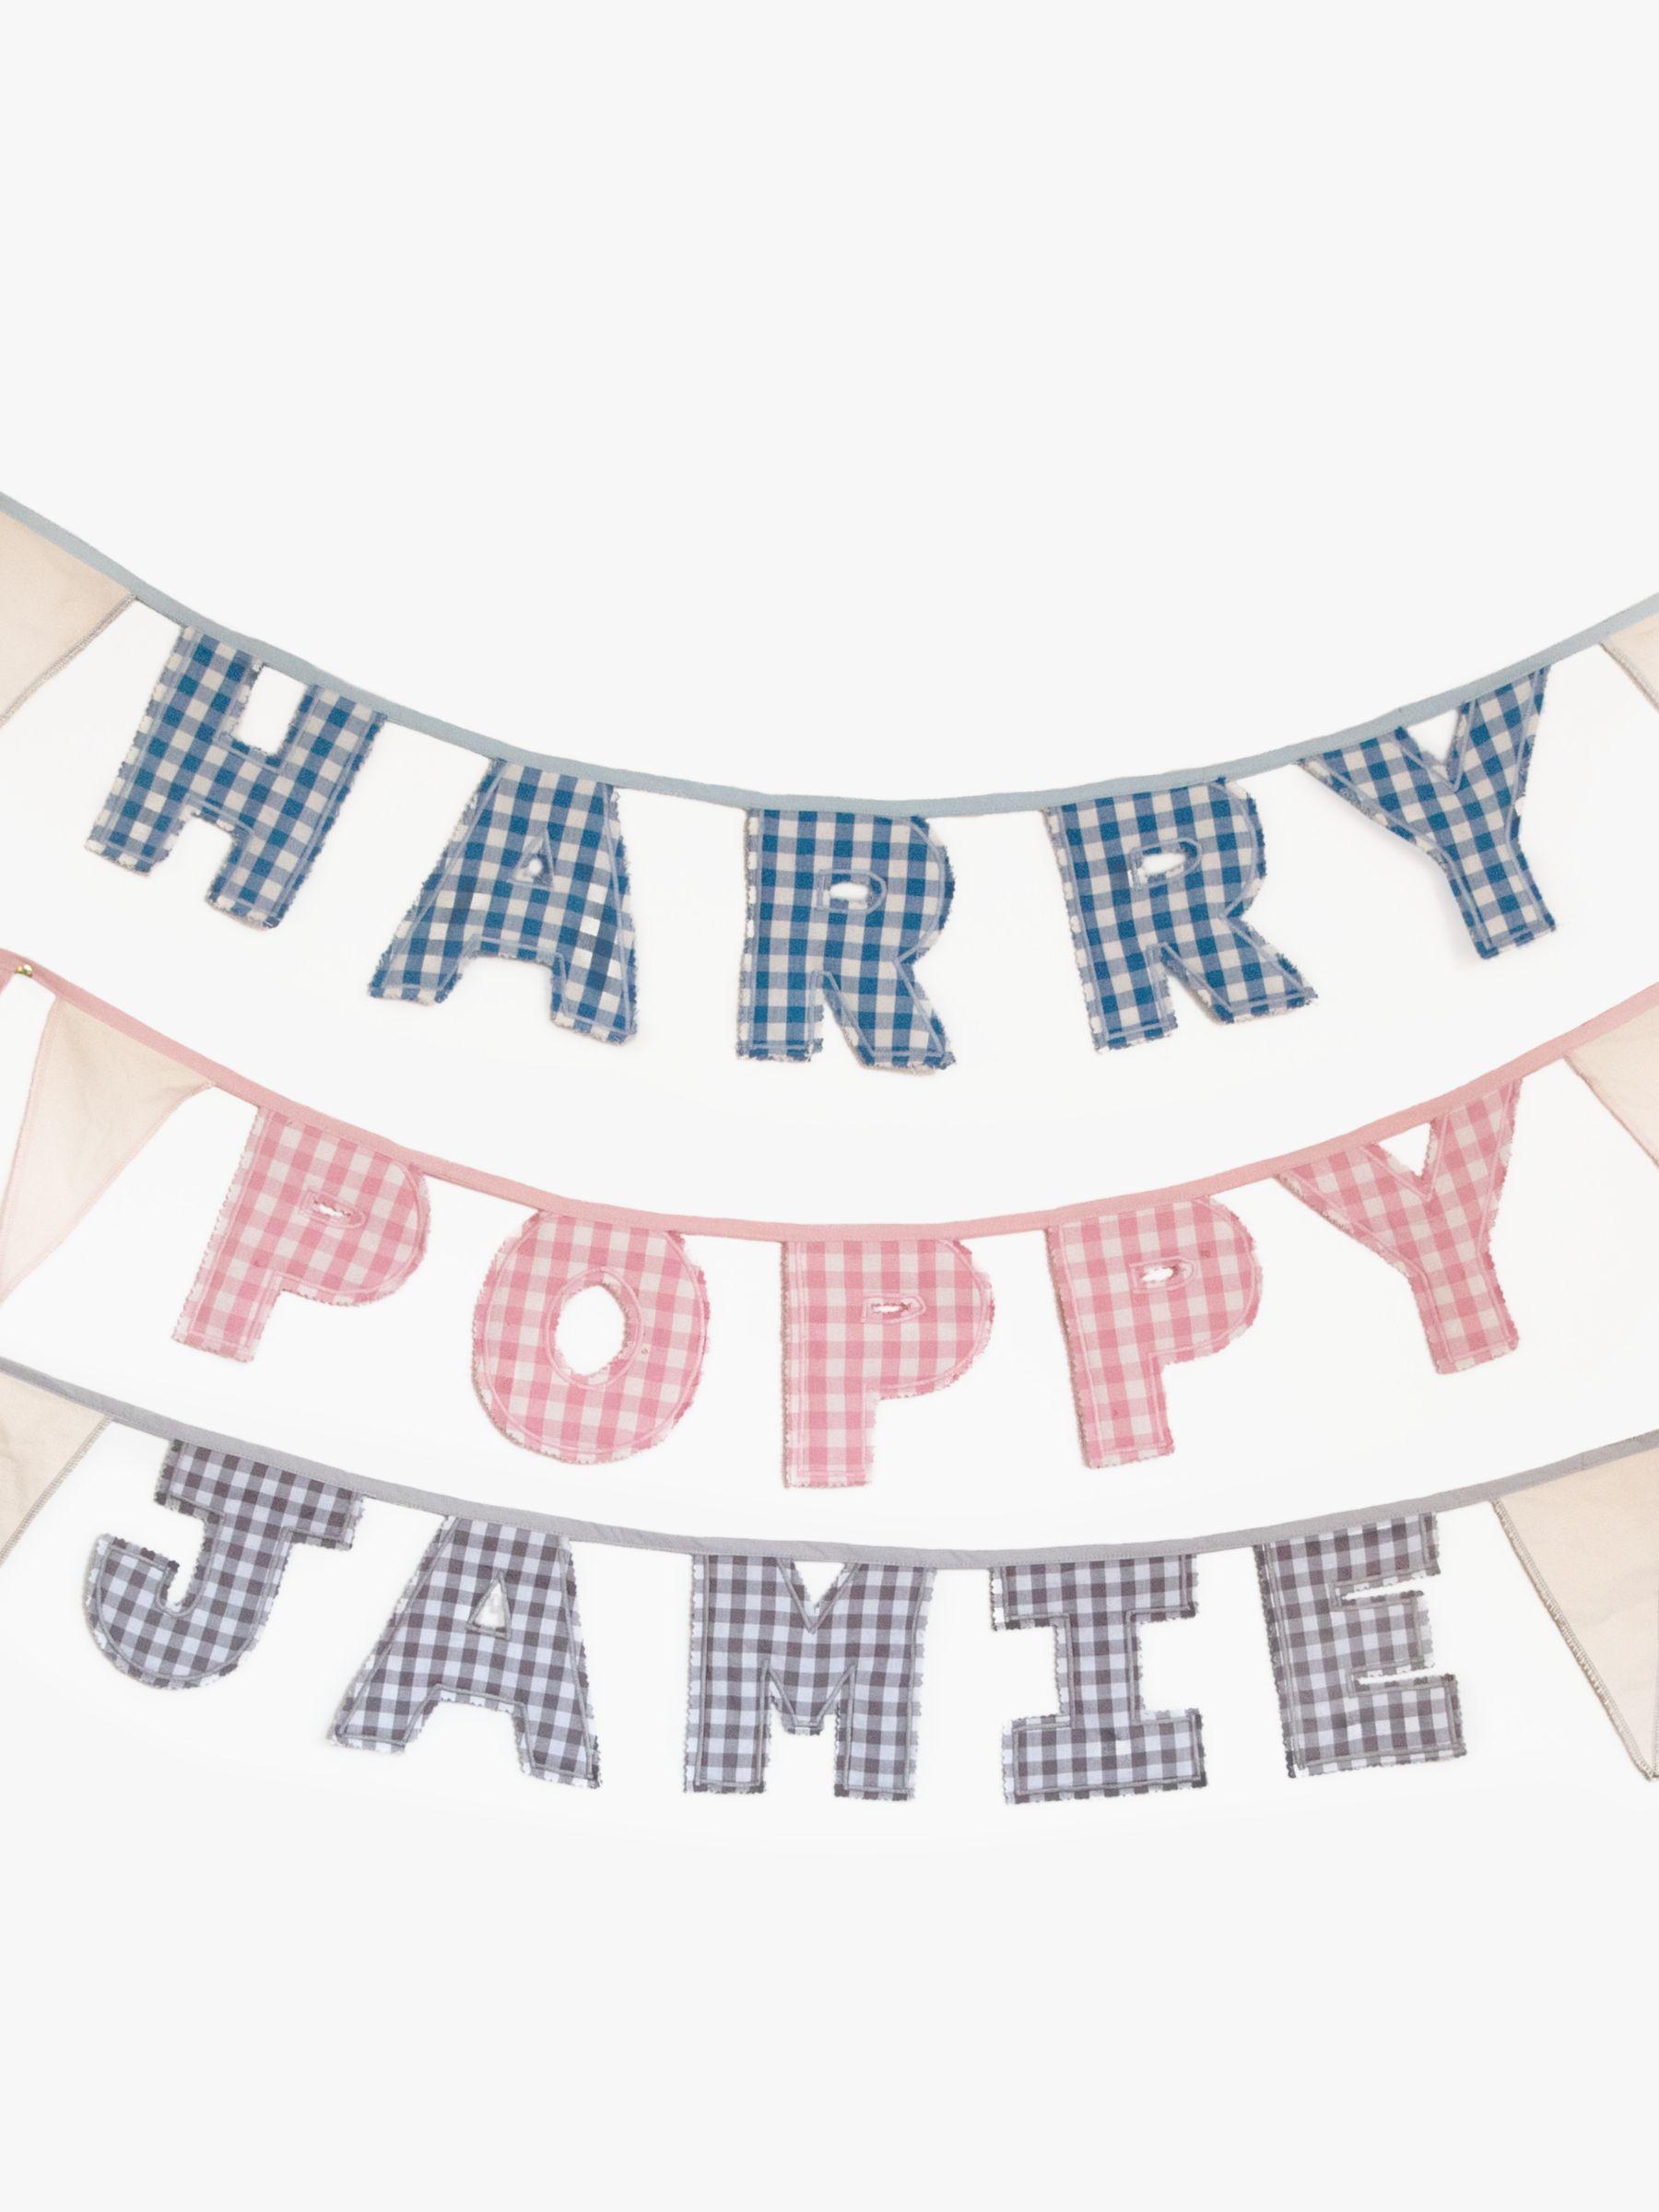 Jonny's Sister Personalised Name Bunting